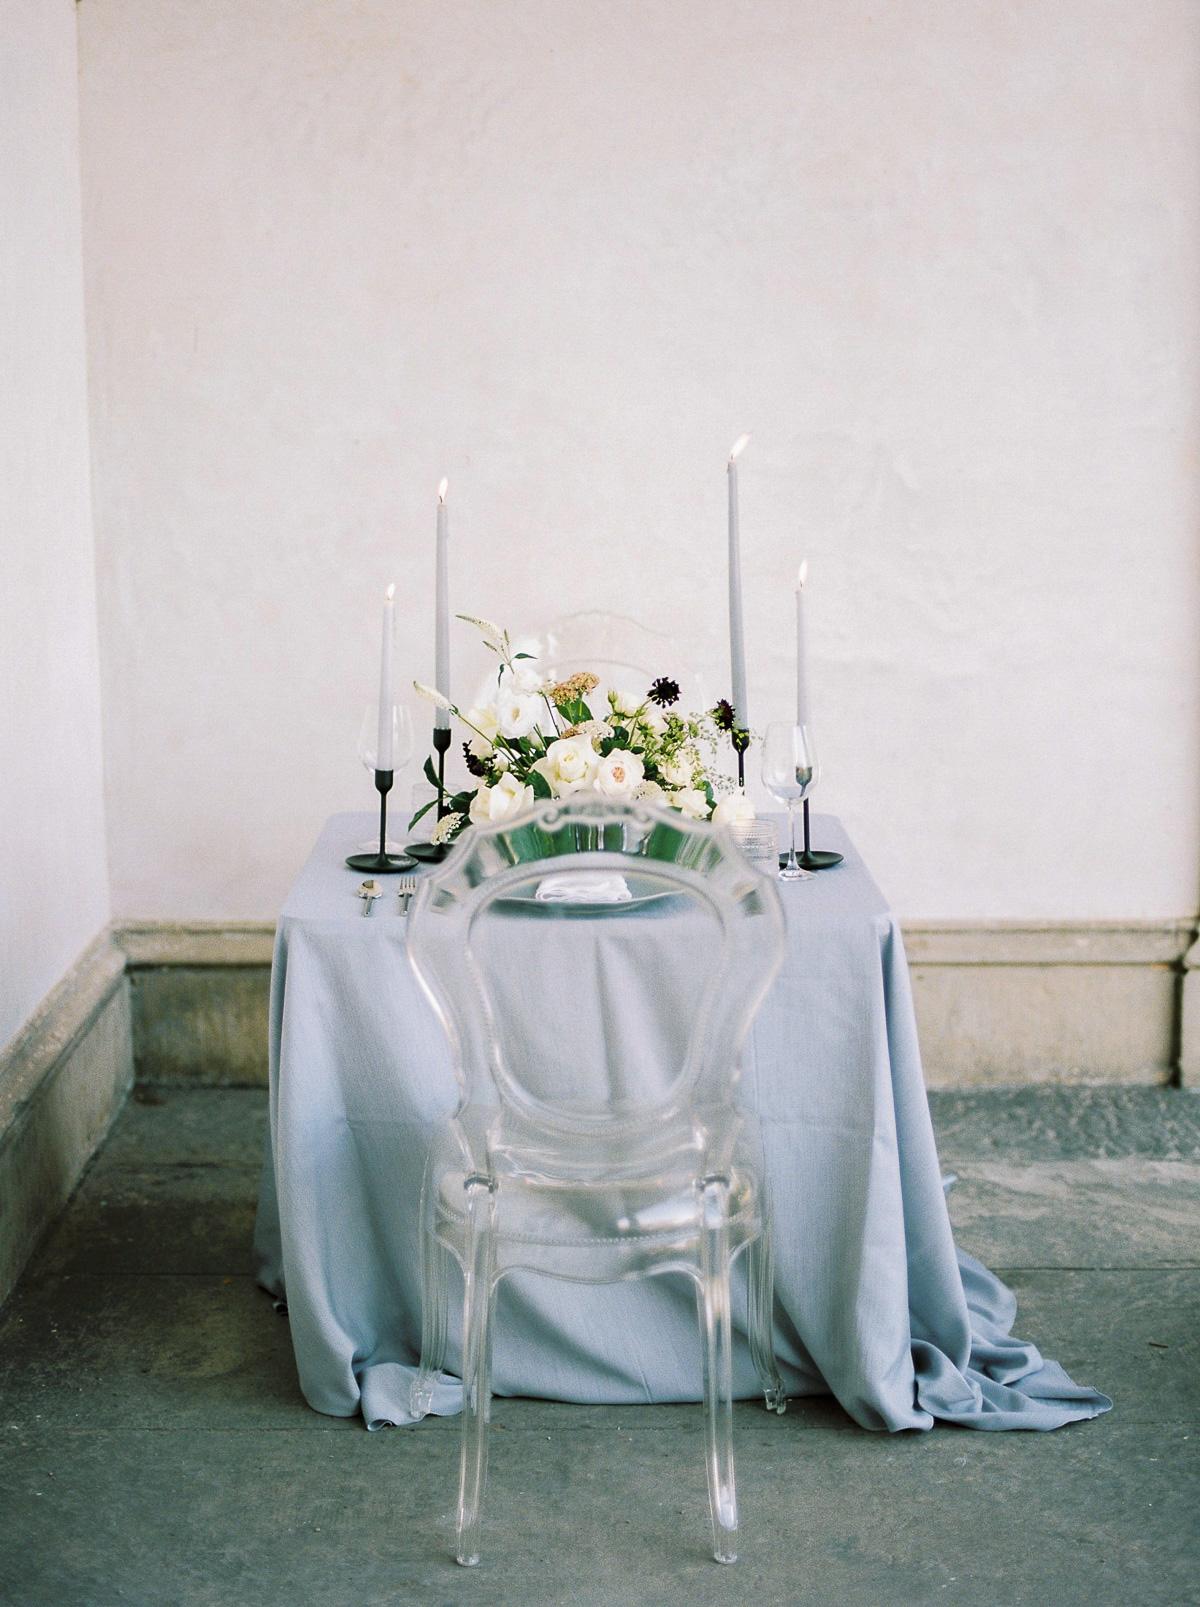 kurtz-orpia-photography-vineyard-bride-swish-list-dundurn-castle-dundas-wedding-editorial-34.jpg